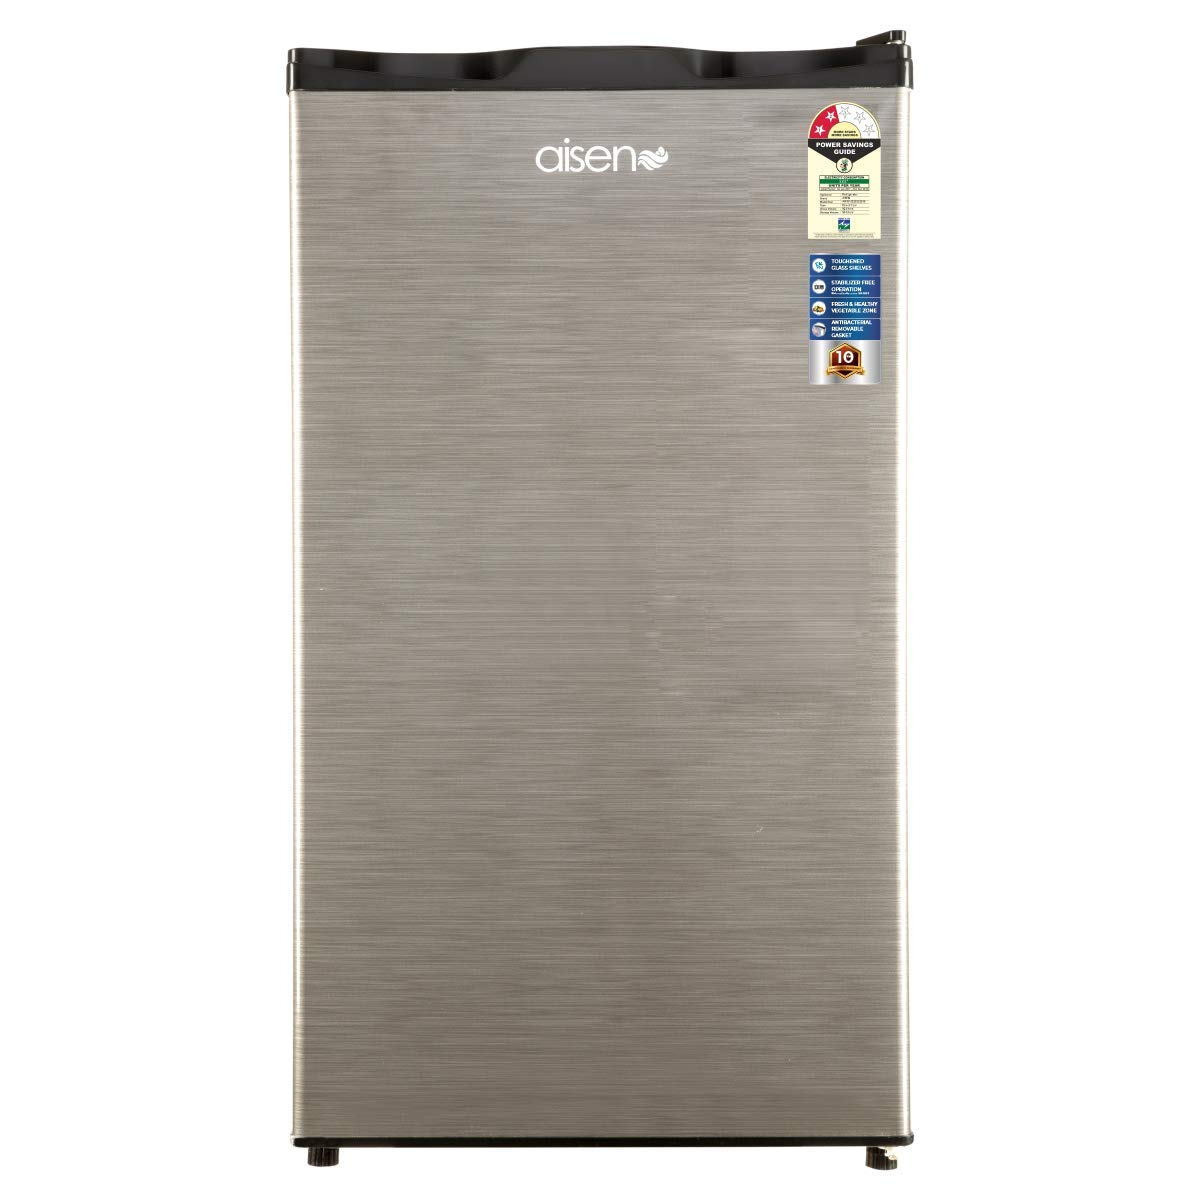 AISEN 100L 2 Star Direct Cool Single Door Mini Refrigerator,